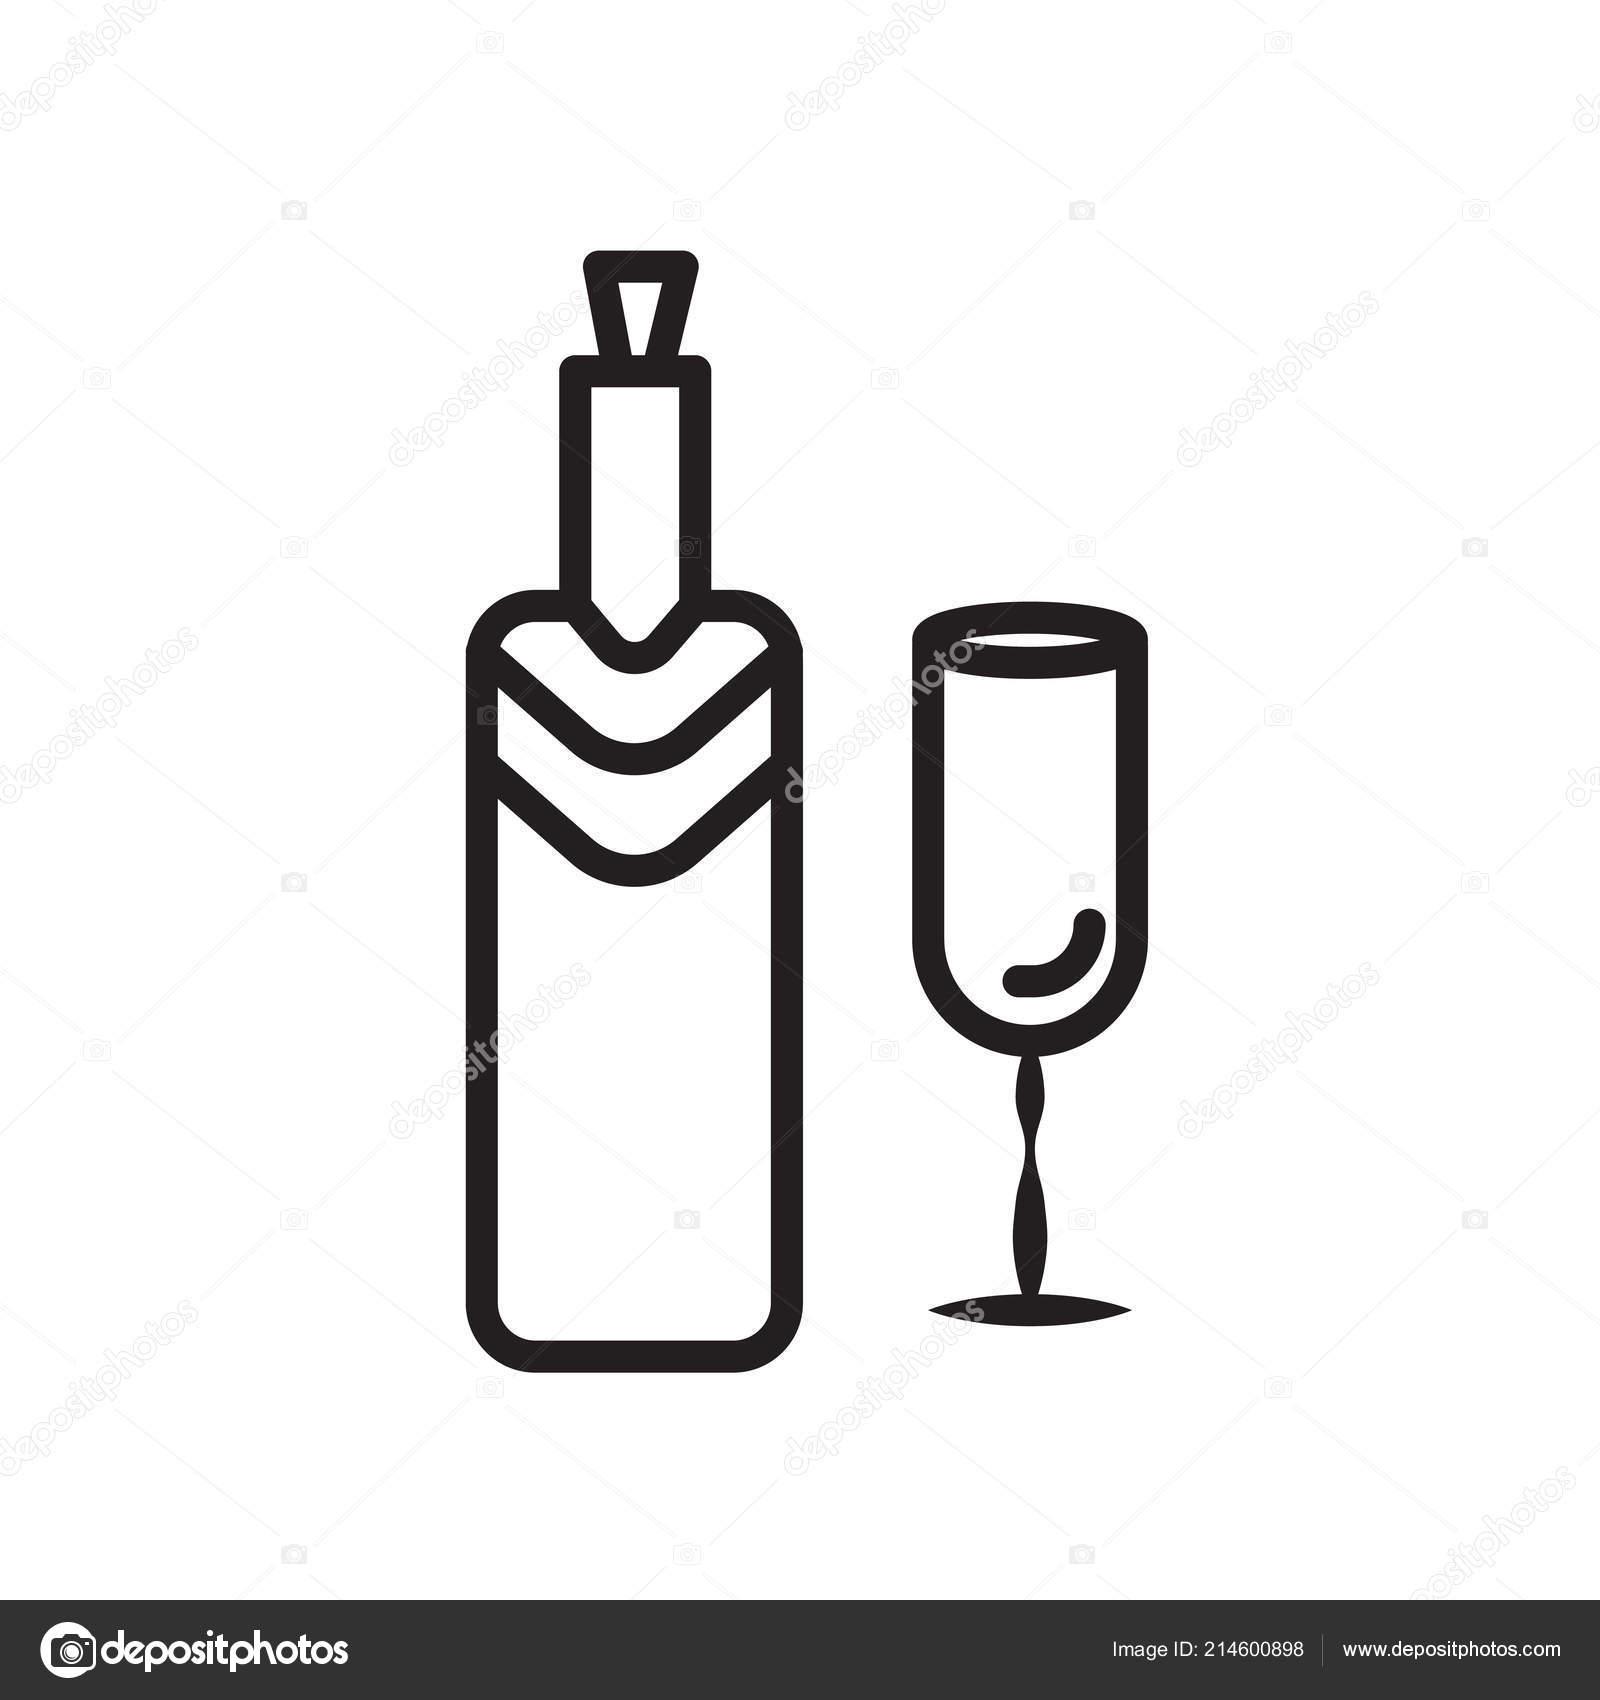 Вина значок вектора, изолированные на белом фоне, вина знак